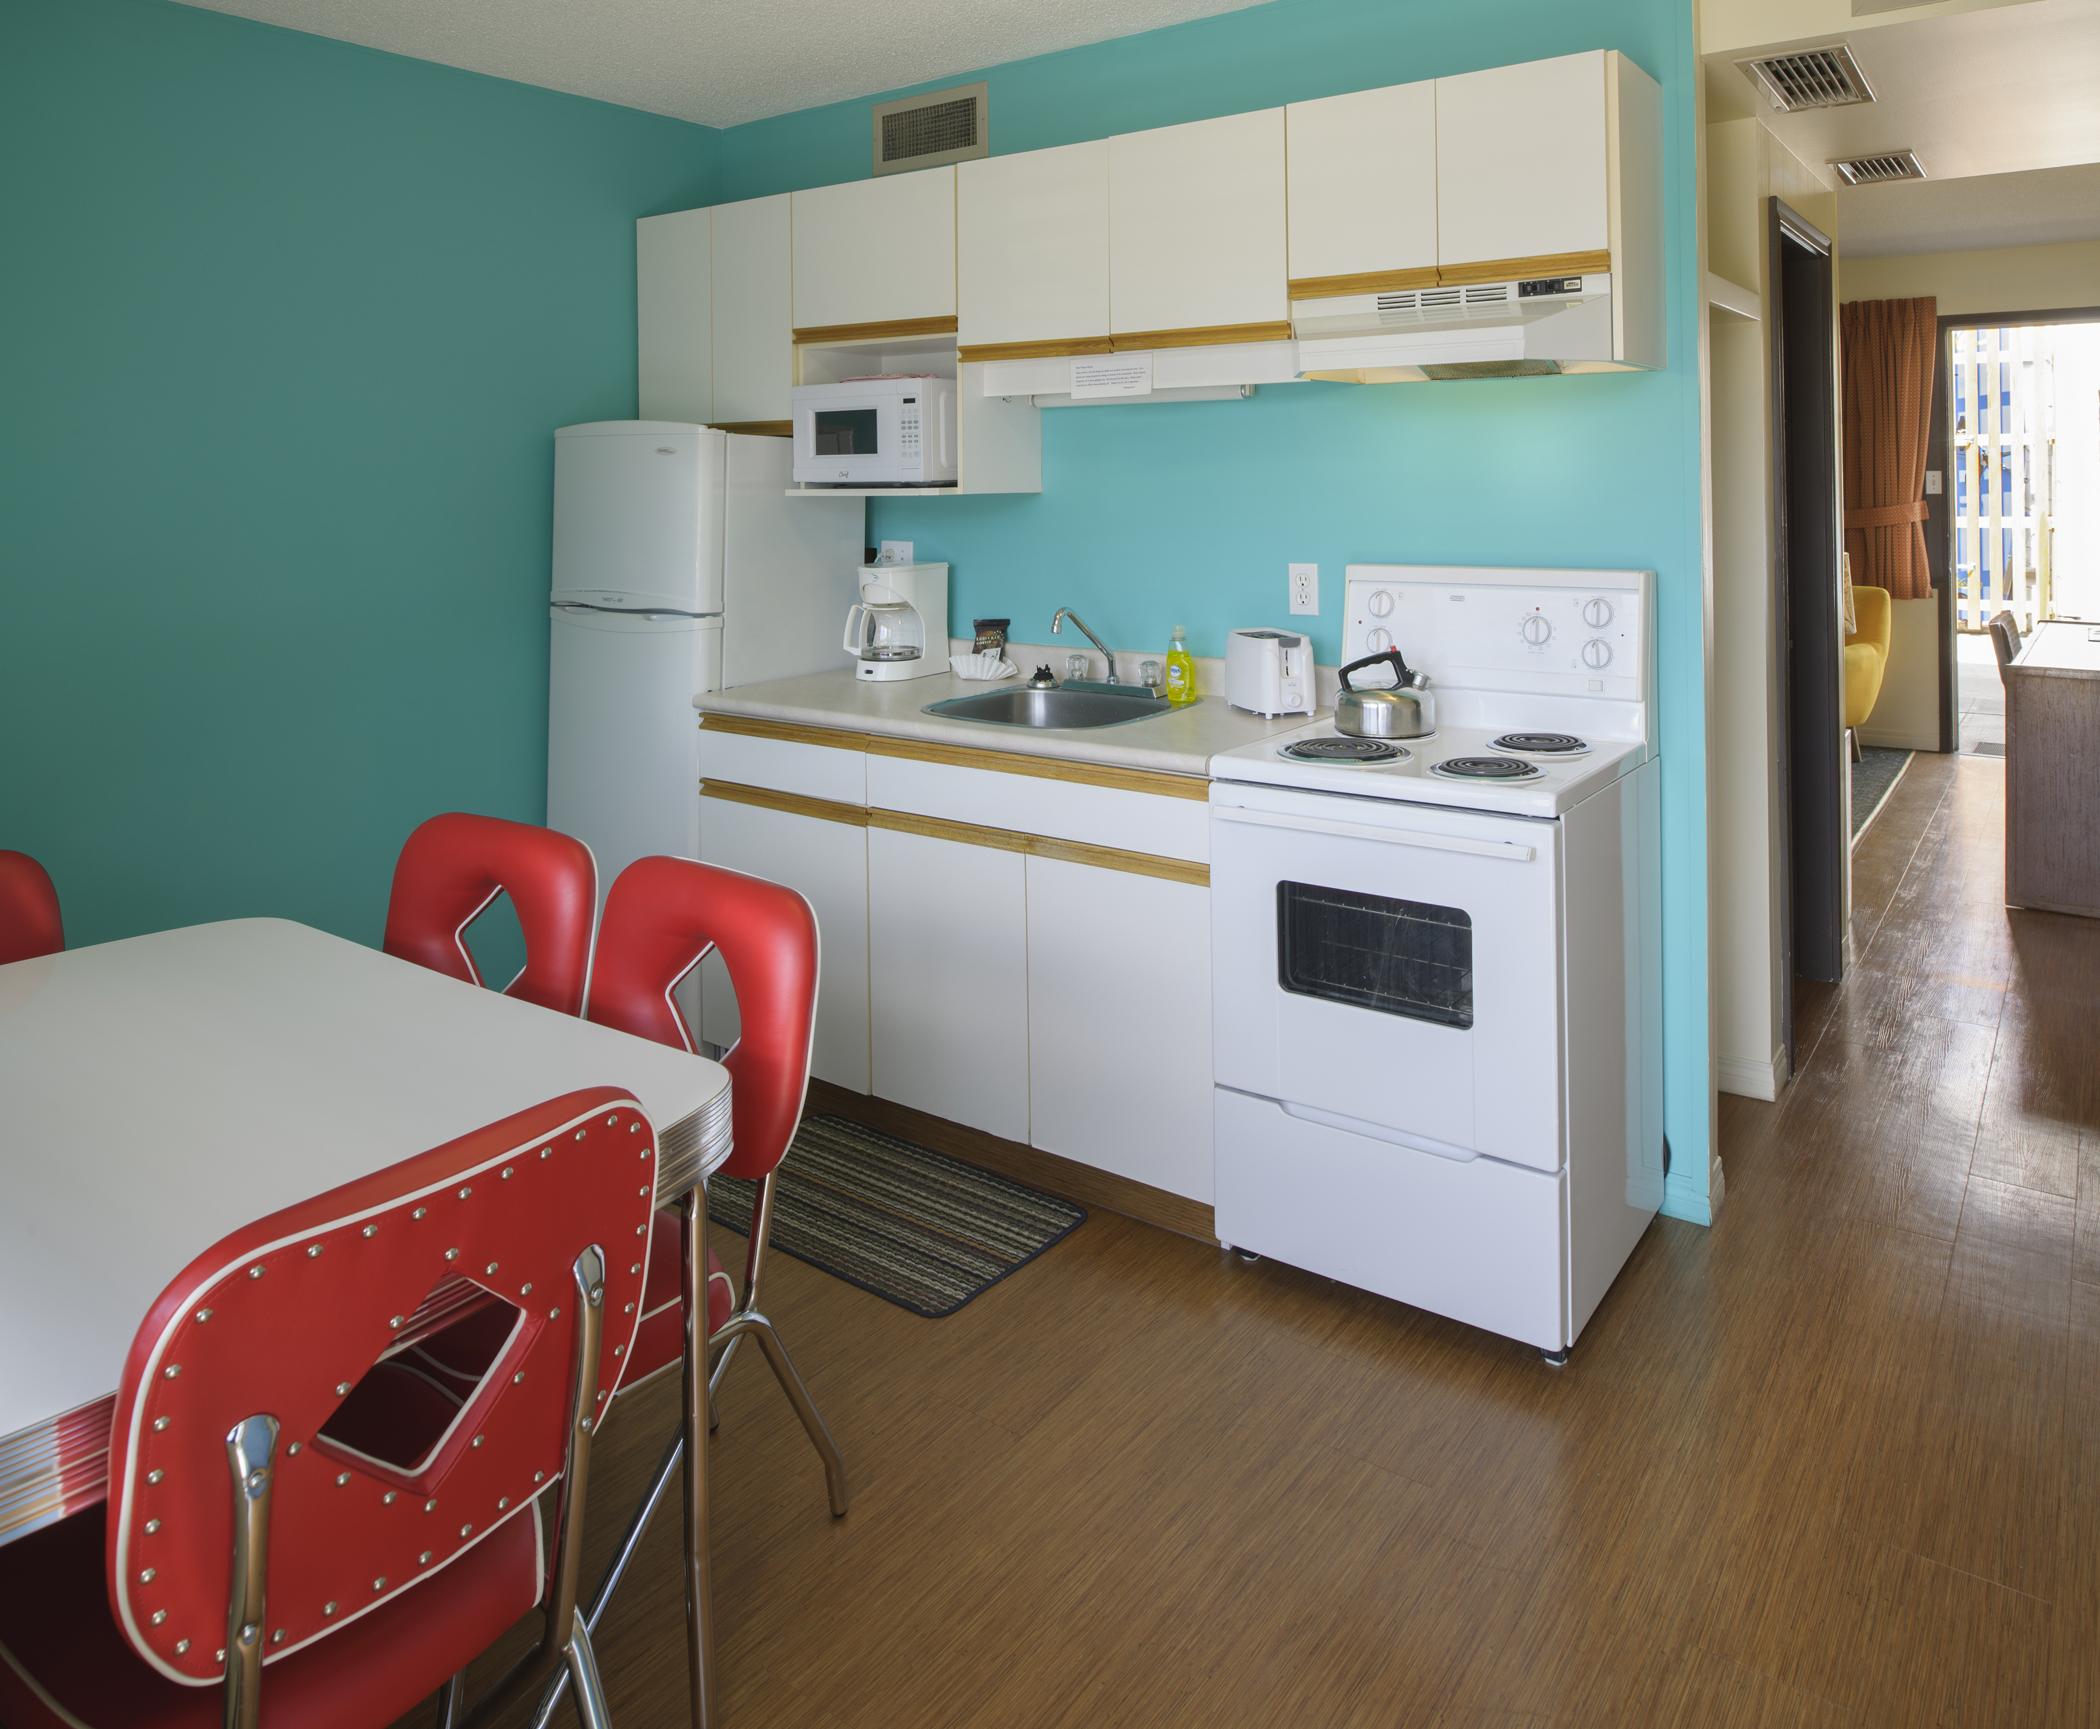 The Motel | Bowmont Motel